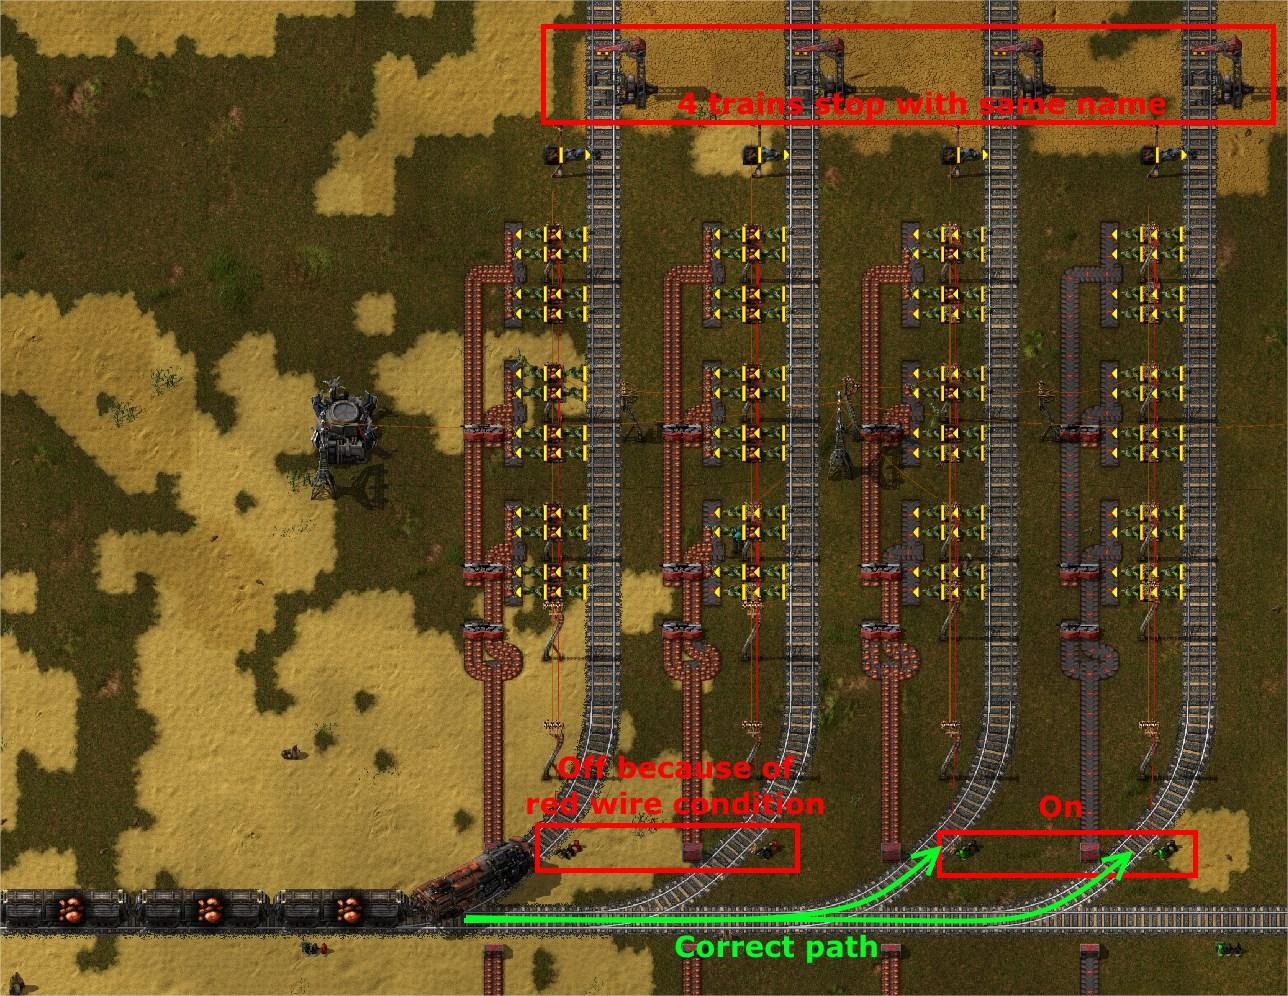 0 13 9] Train path finding ignore Red Train signal